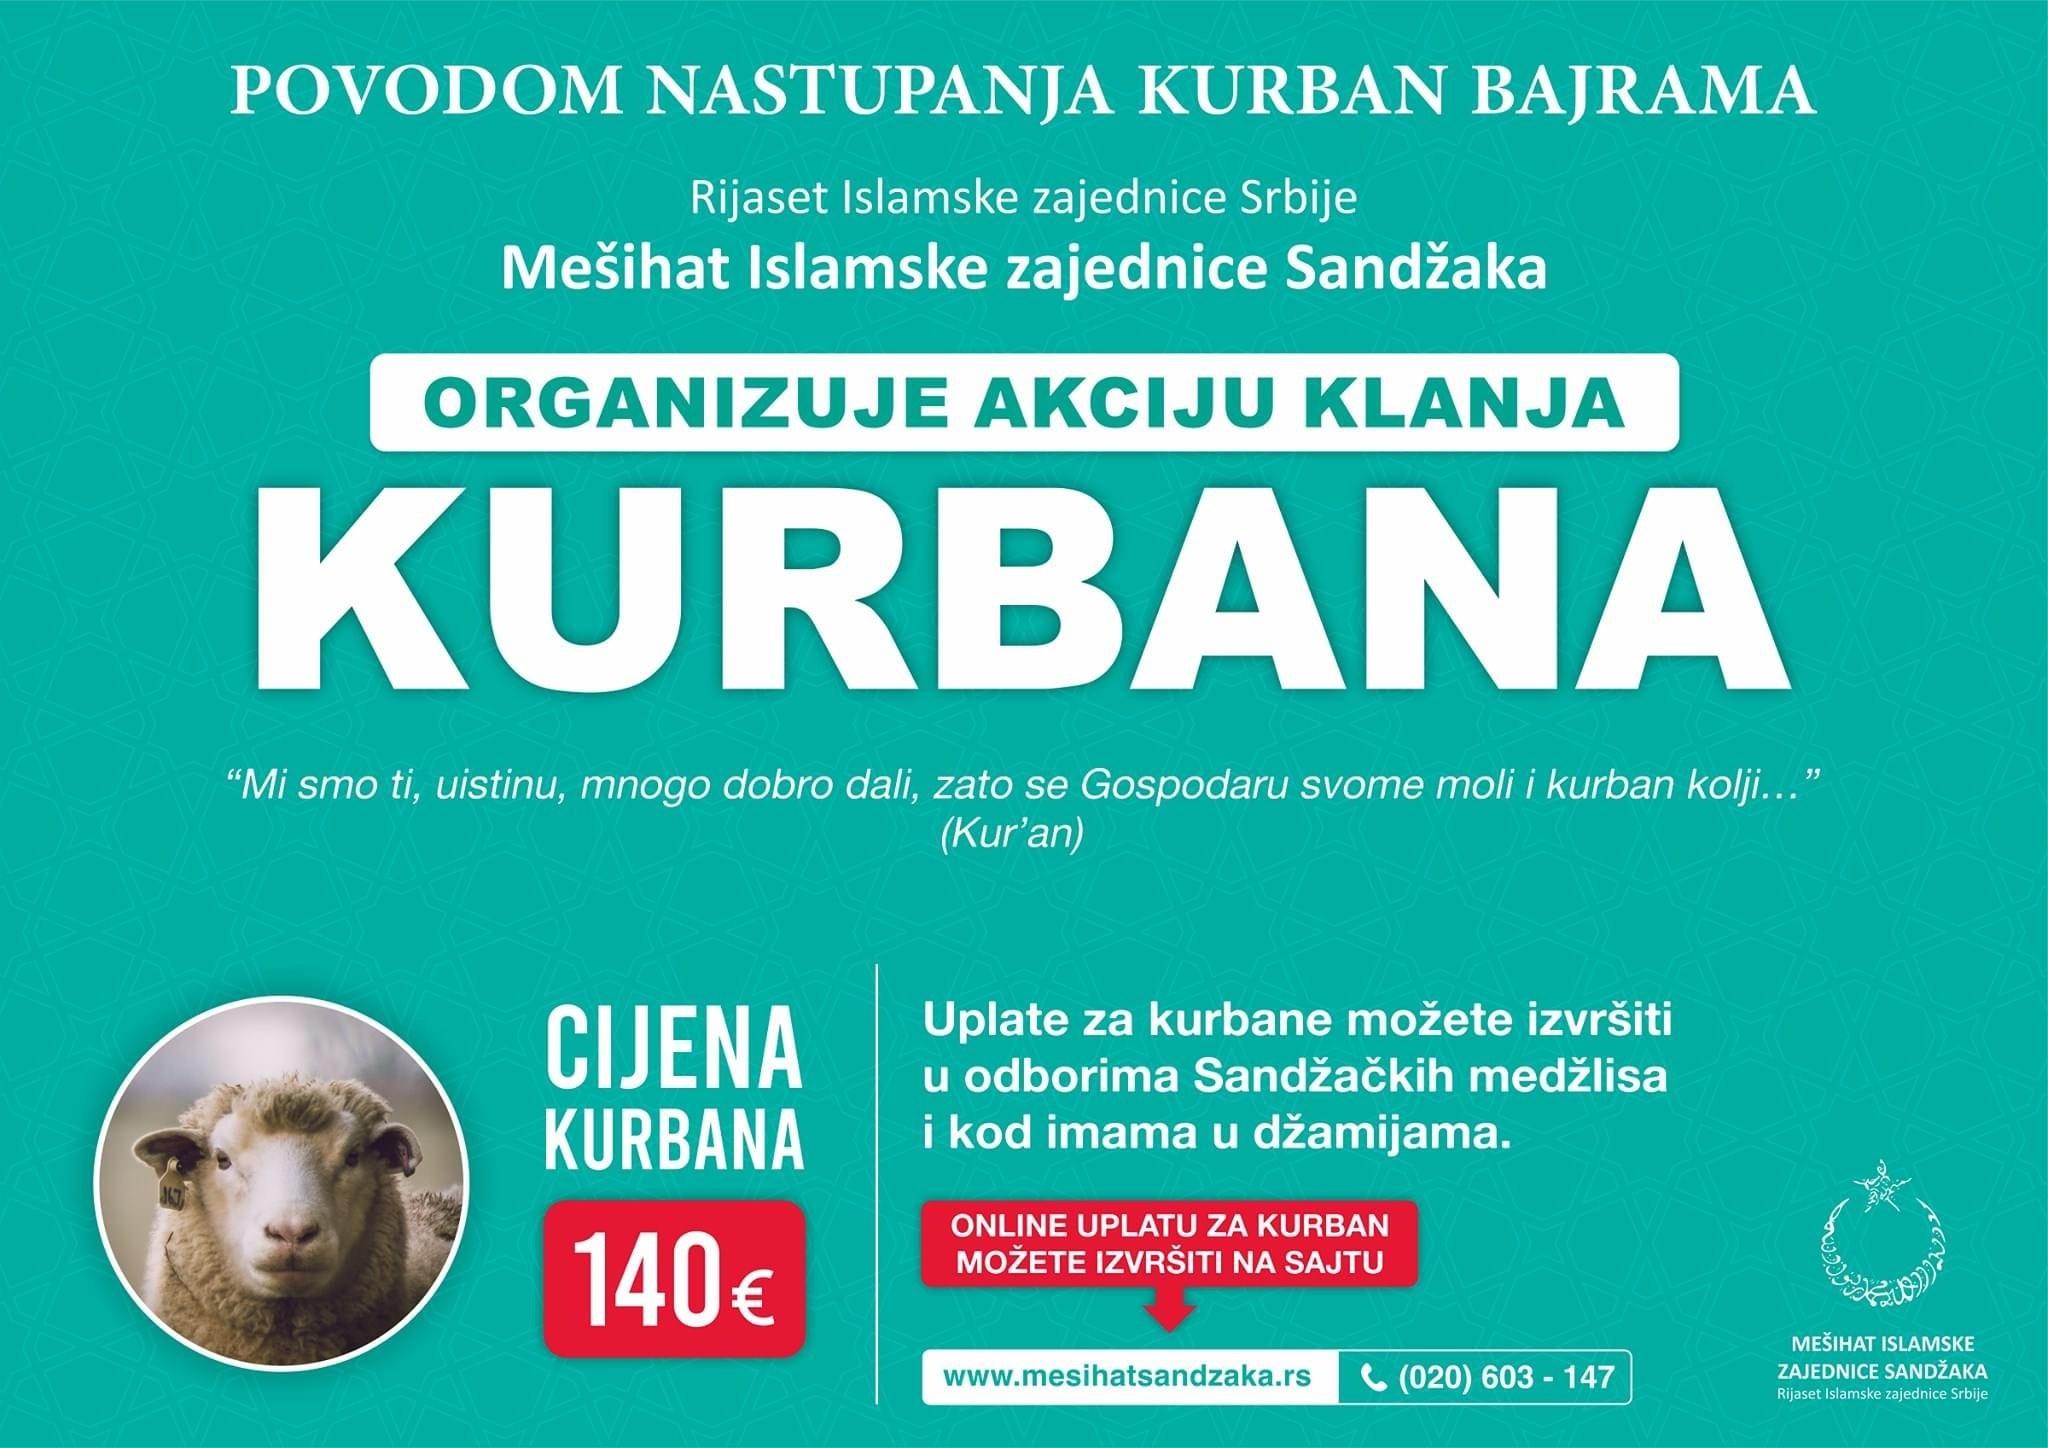 mesihat-sandzaka:-kurban-140-evra,-uplate-i-putem-pejpala